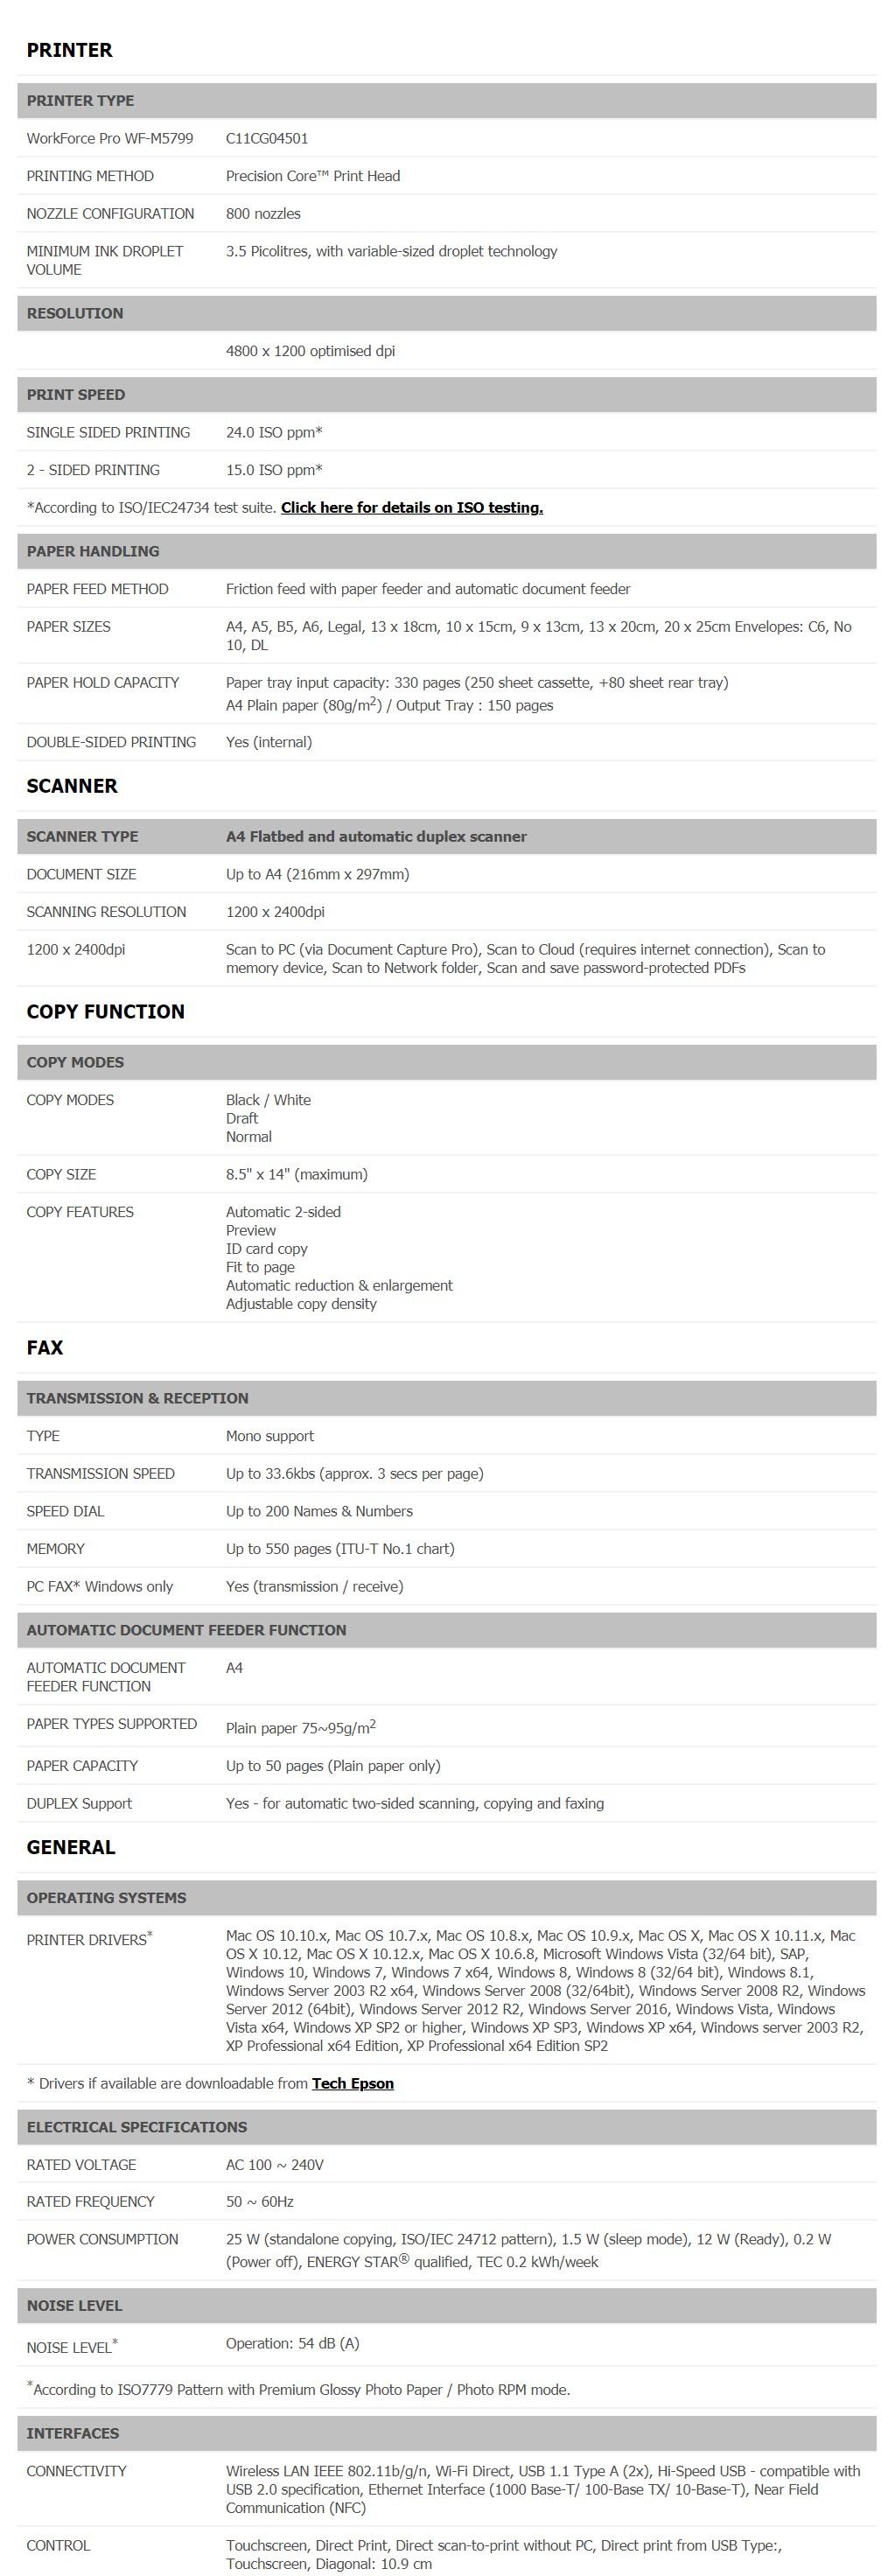 Epson WorkForce Pro WF-M5799 A4 Mono Wireless Inkjet Printer - Desktop Overview 2